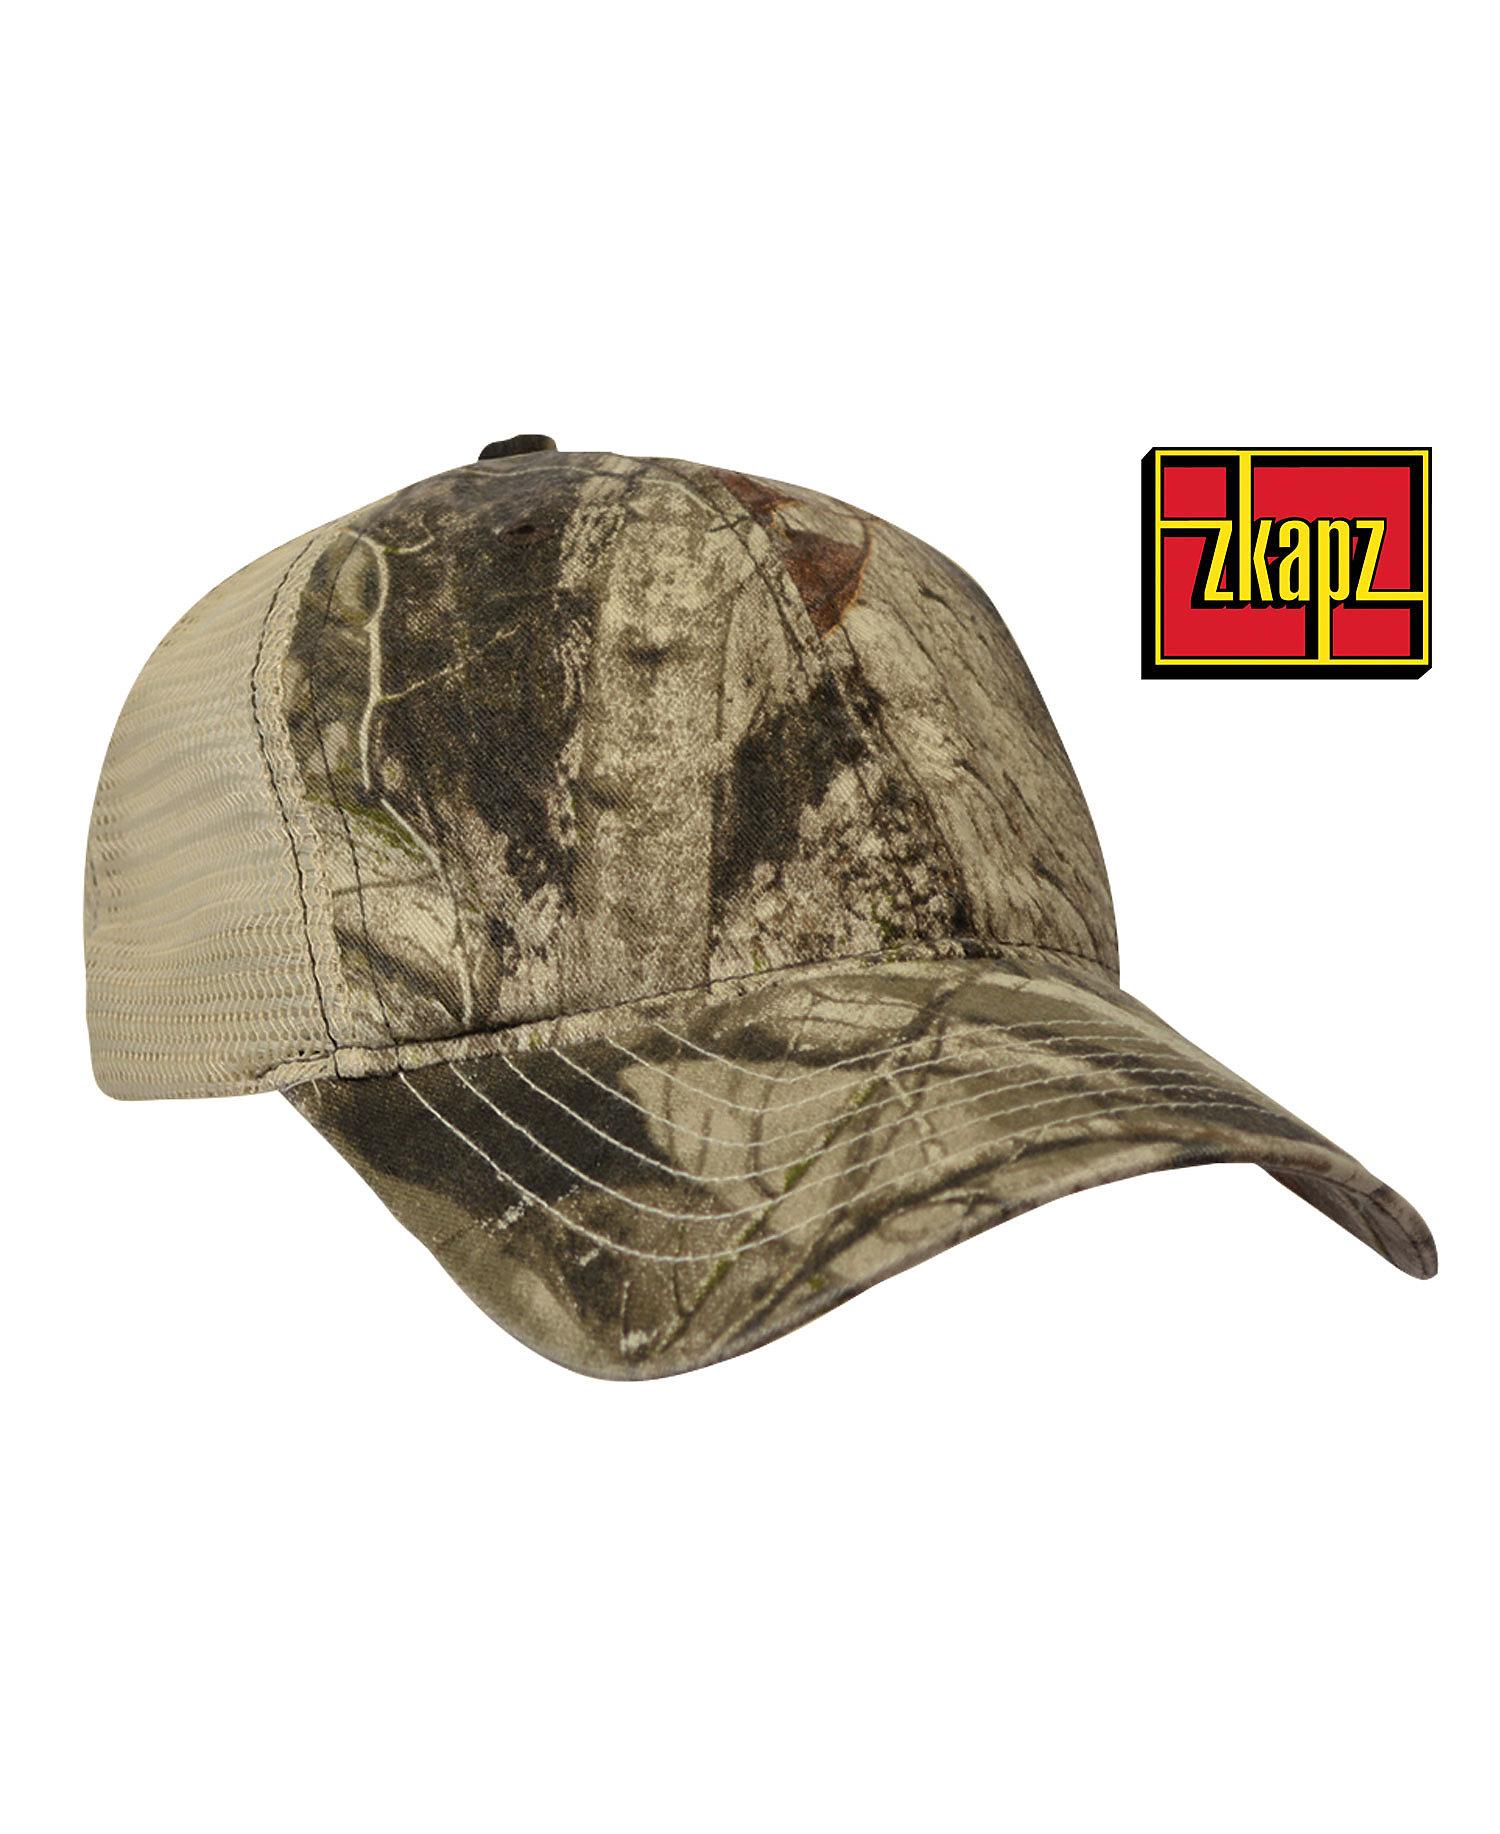 6475ff7608f KC Caps ZK641 - ZKAPZ Bio-Washed Cotton Trucker Cap With Soft Mesh Back